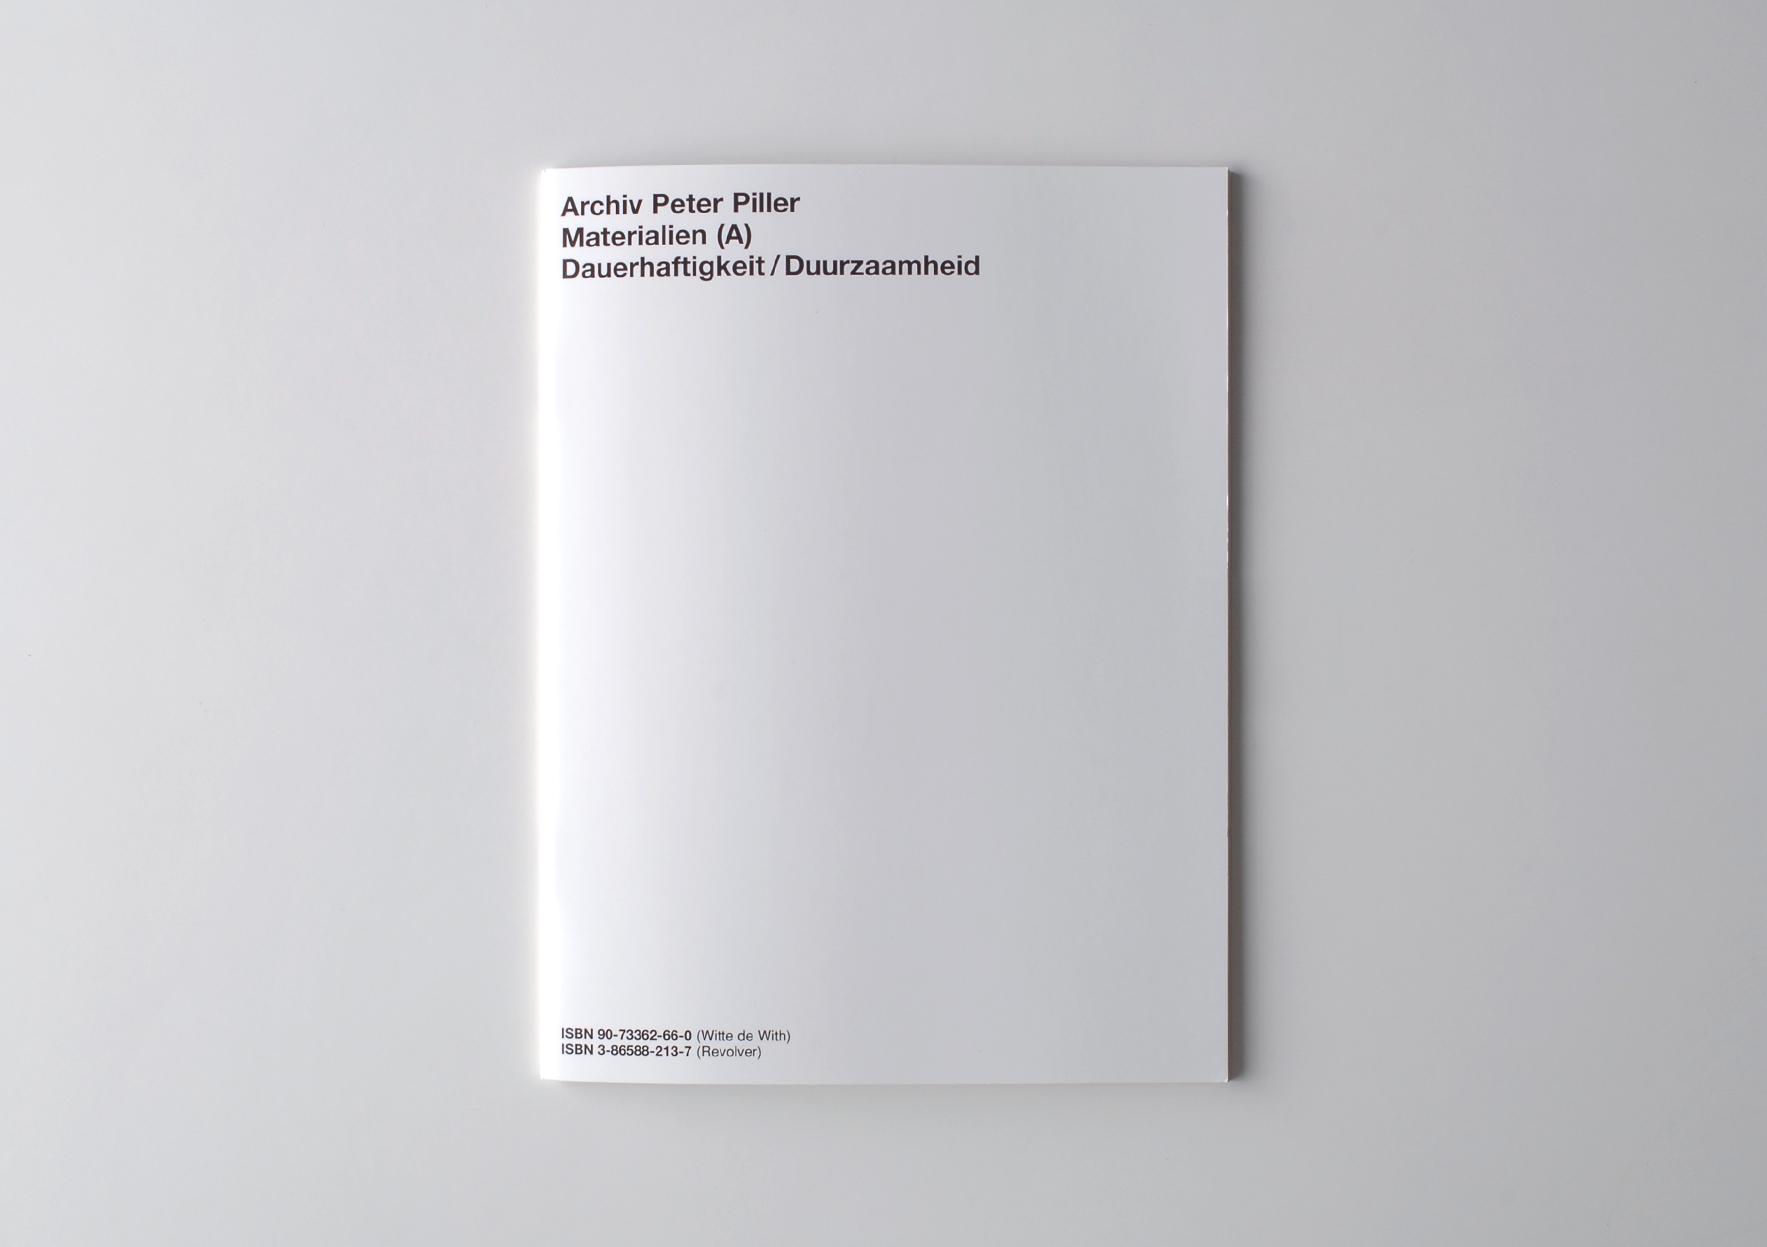 | Archiv Peter Piller: Materialien (A) Dauerhaftigkeit / Duurzaamheid | ProjecteSD